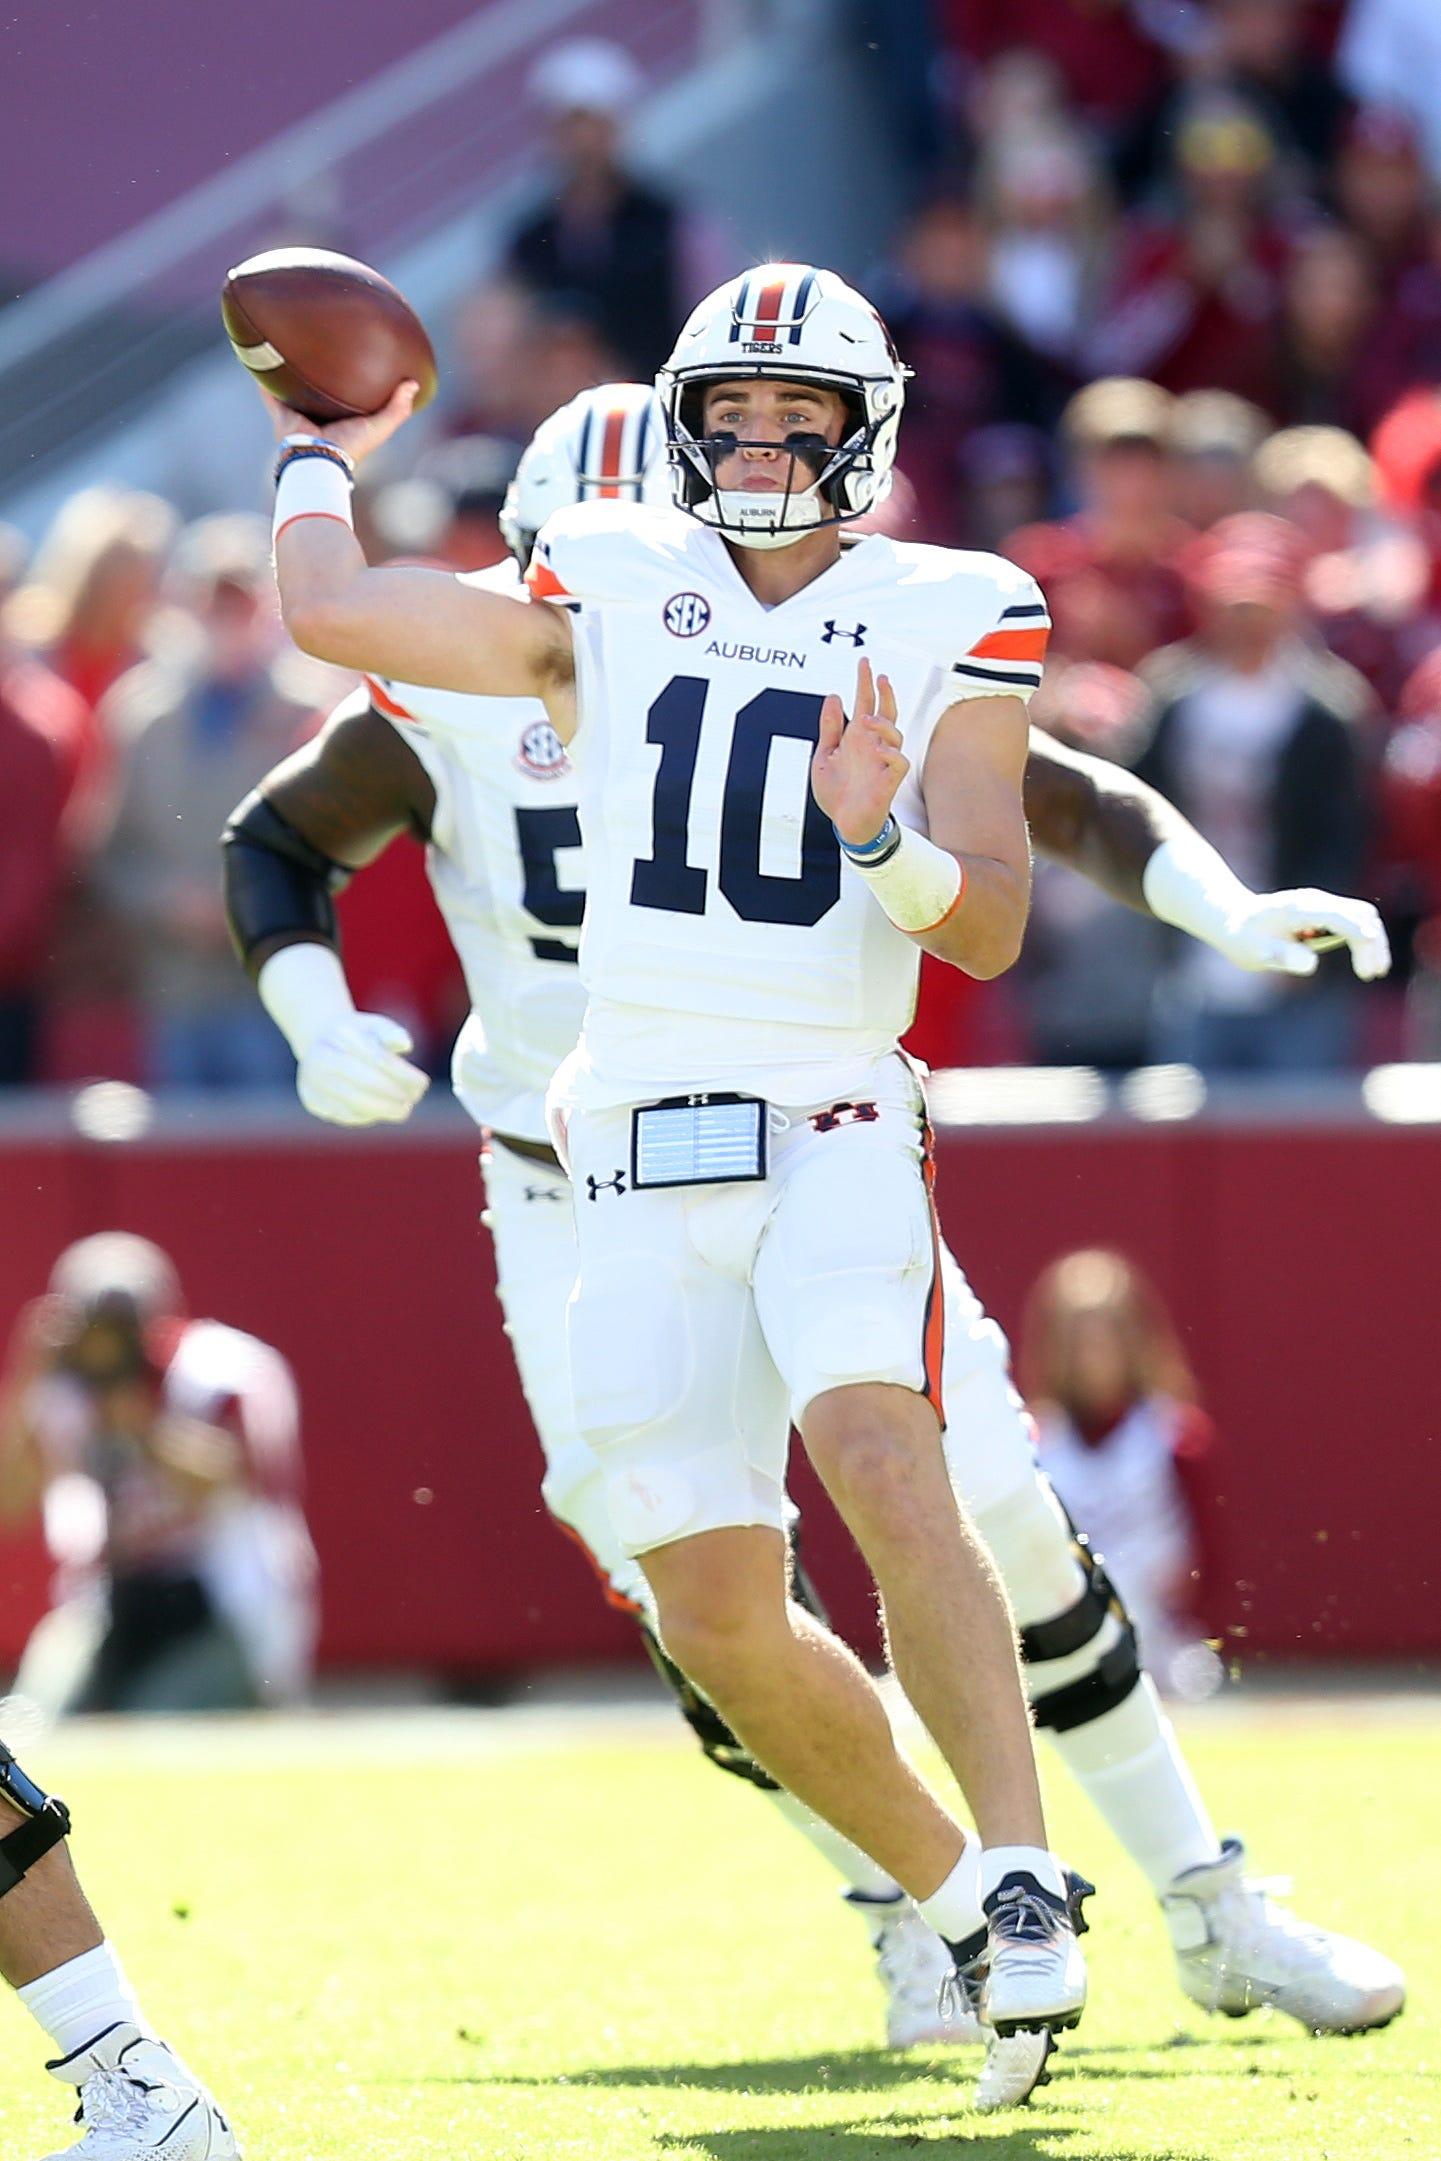 Big plays help Auburn football hold off No. 19 Arkansas for second SEC road win